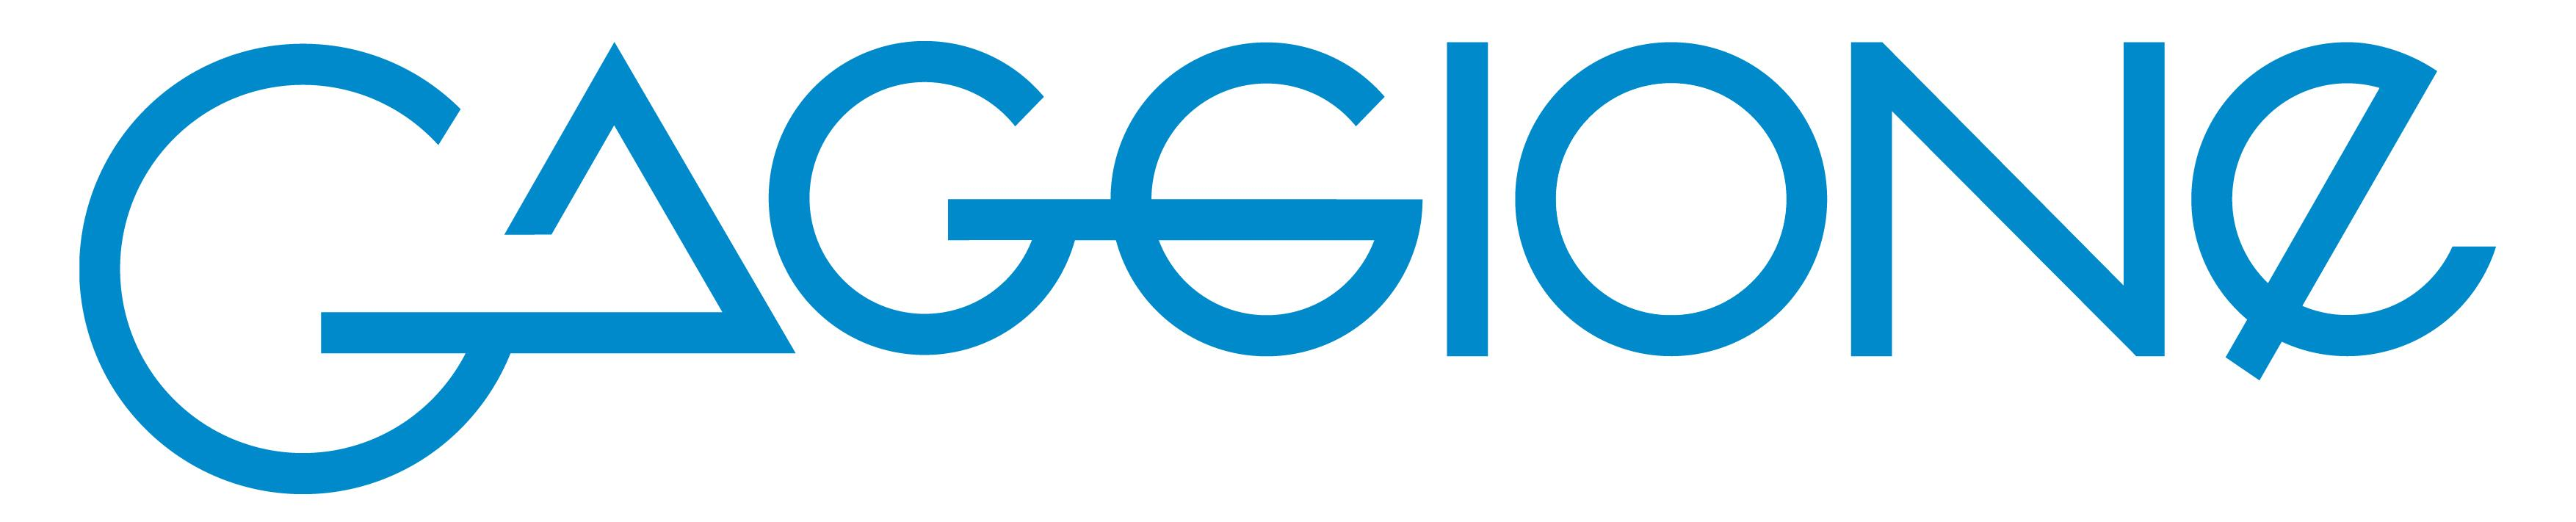 GAGGIONE